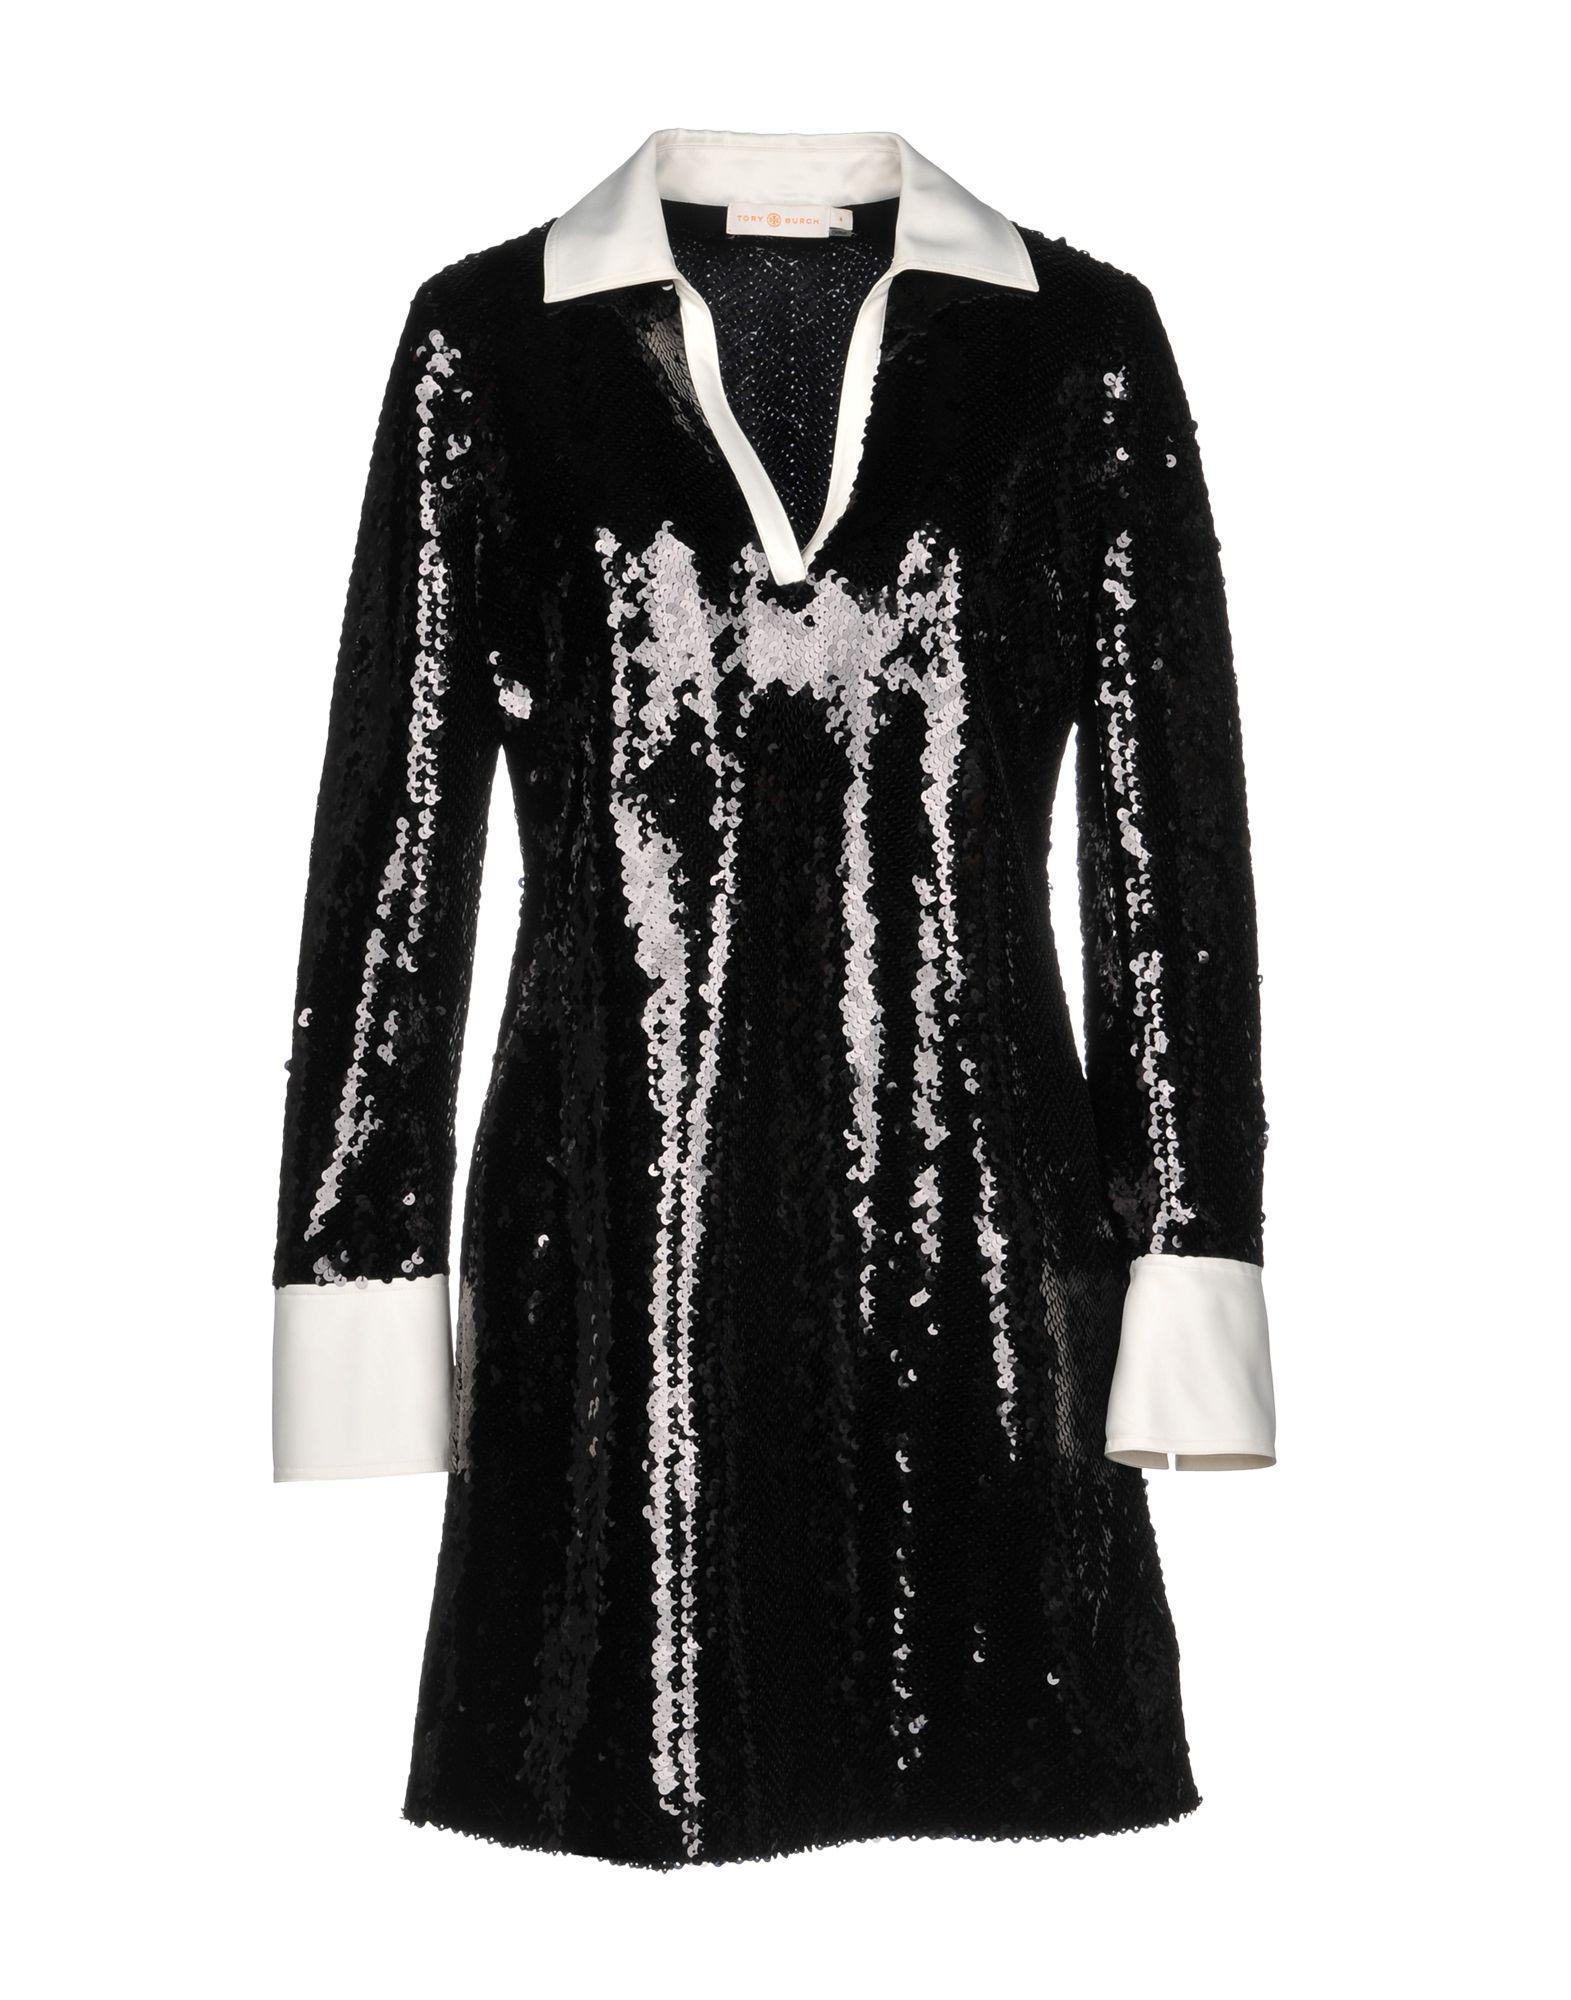 Tory Burch Short Dresses In Black